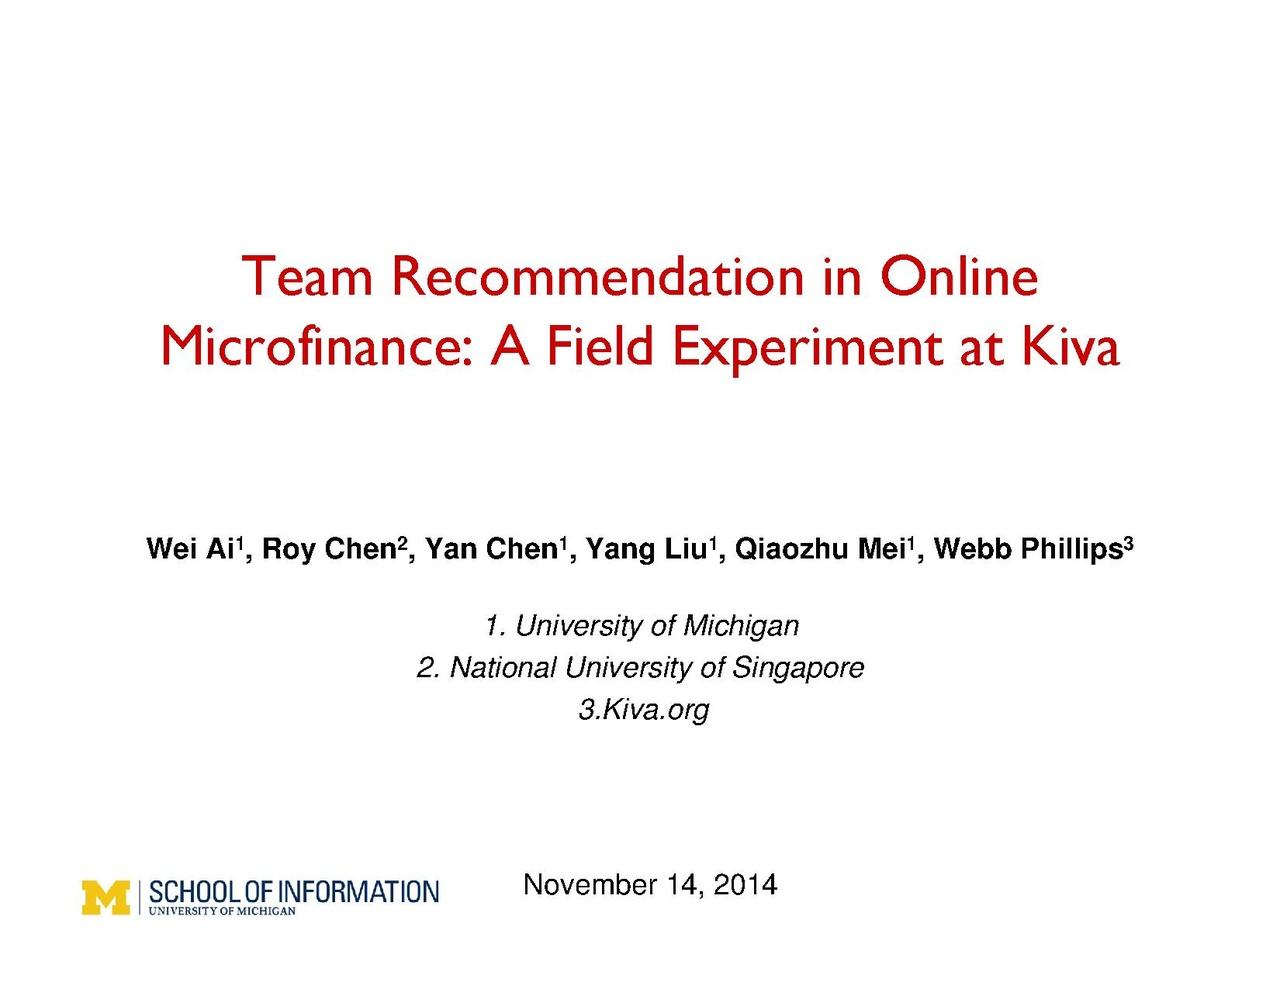 Team Recommendation: File:YanChen Kiva Team Recommendation 2014 1114 WMF.pdf